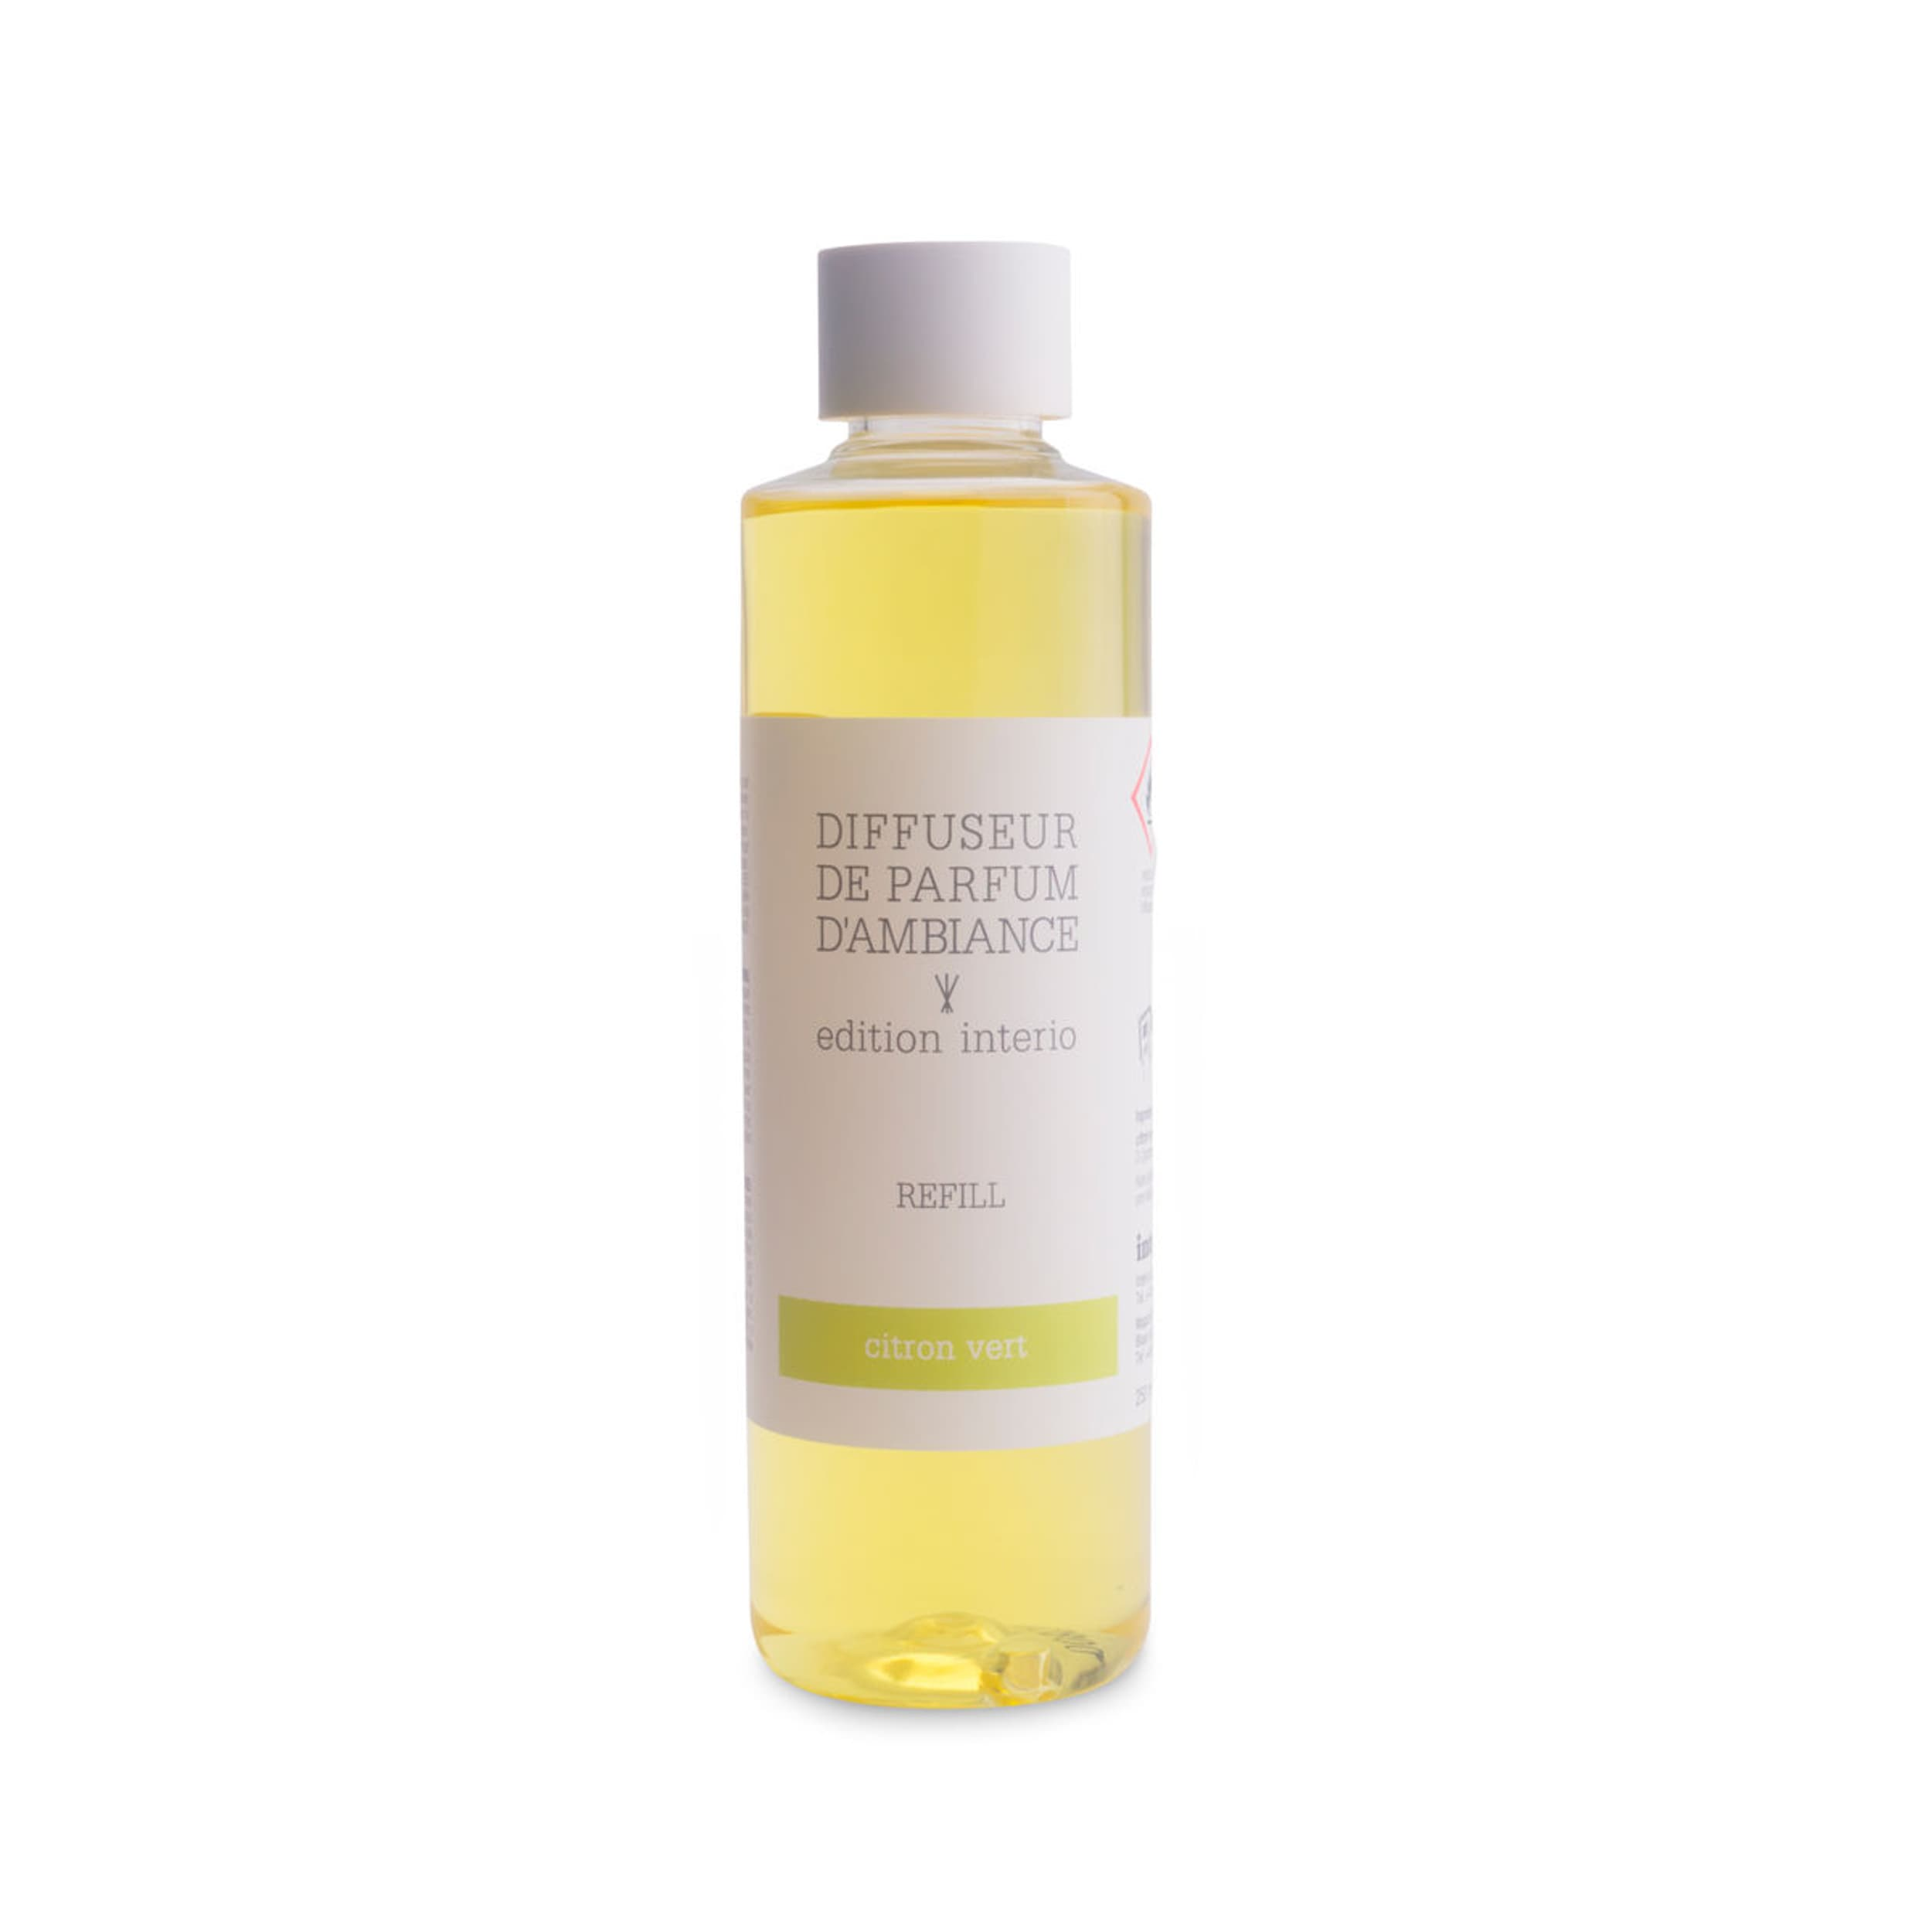 Image of Citron Vert REFILL DE PARFUM D´AMBIANCE